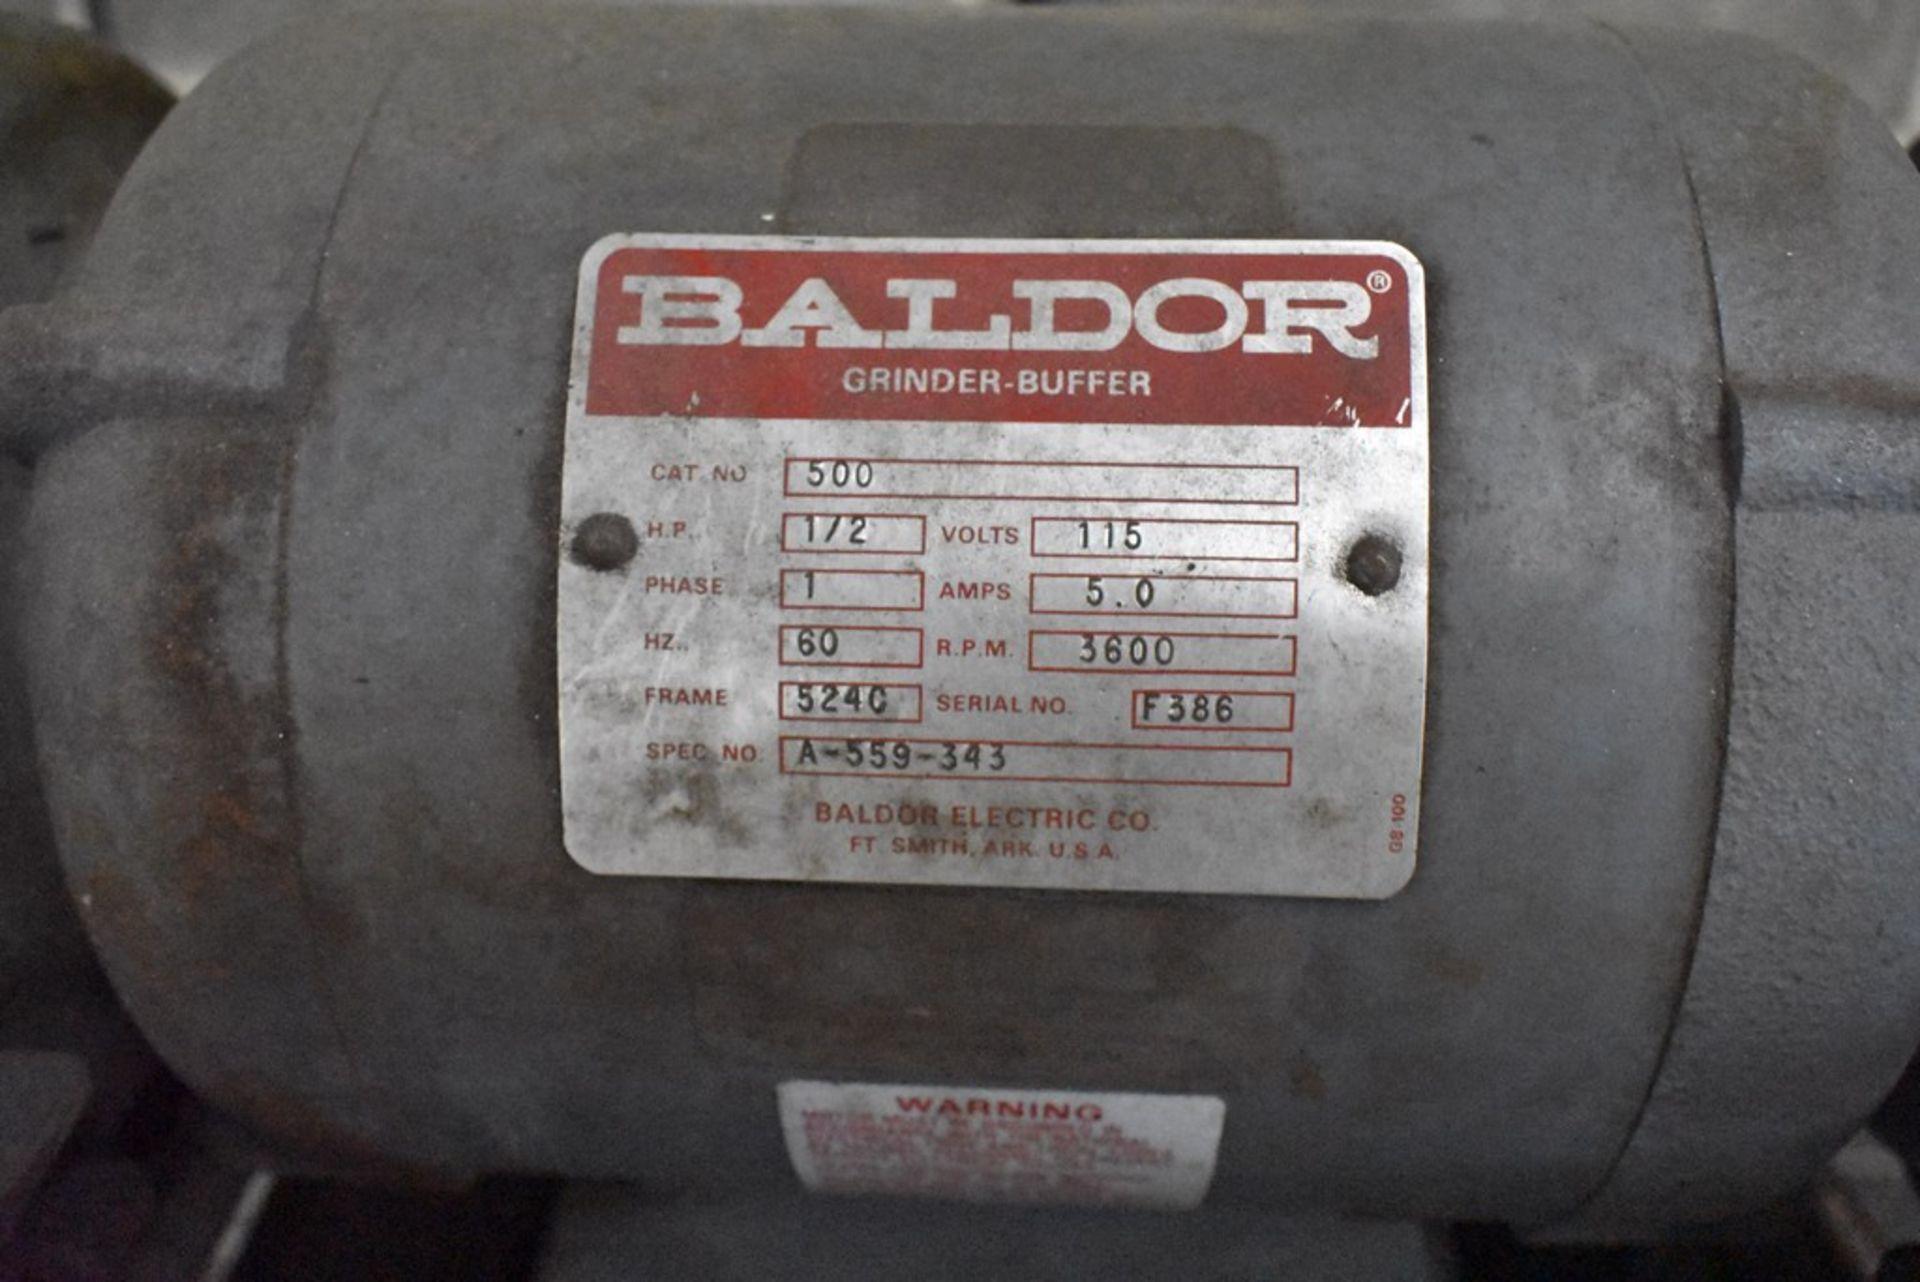 BALDOR ½ HP PEDESTAL DOUBLE END CARBIDE TOOL GRINDER, S/N A-559-343 - Image 6 of 7